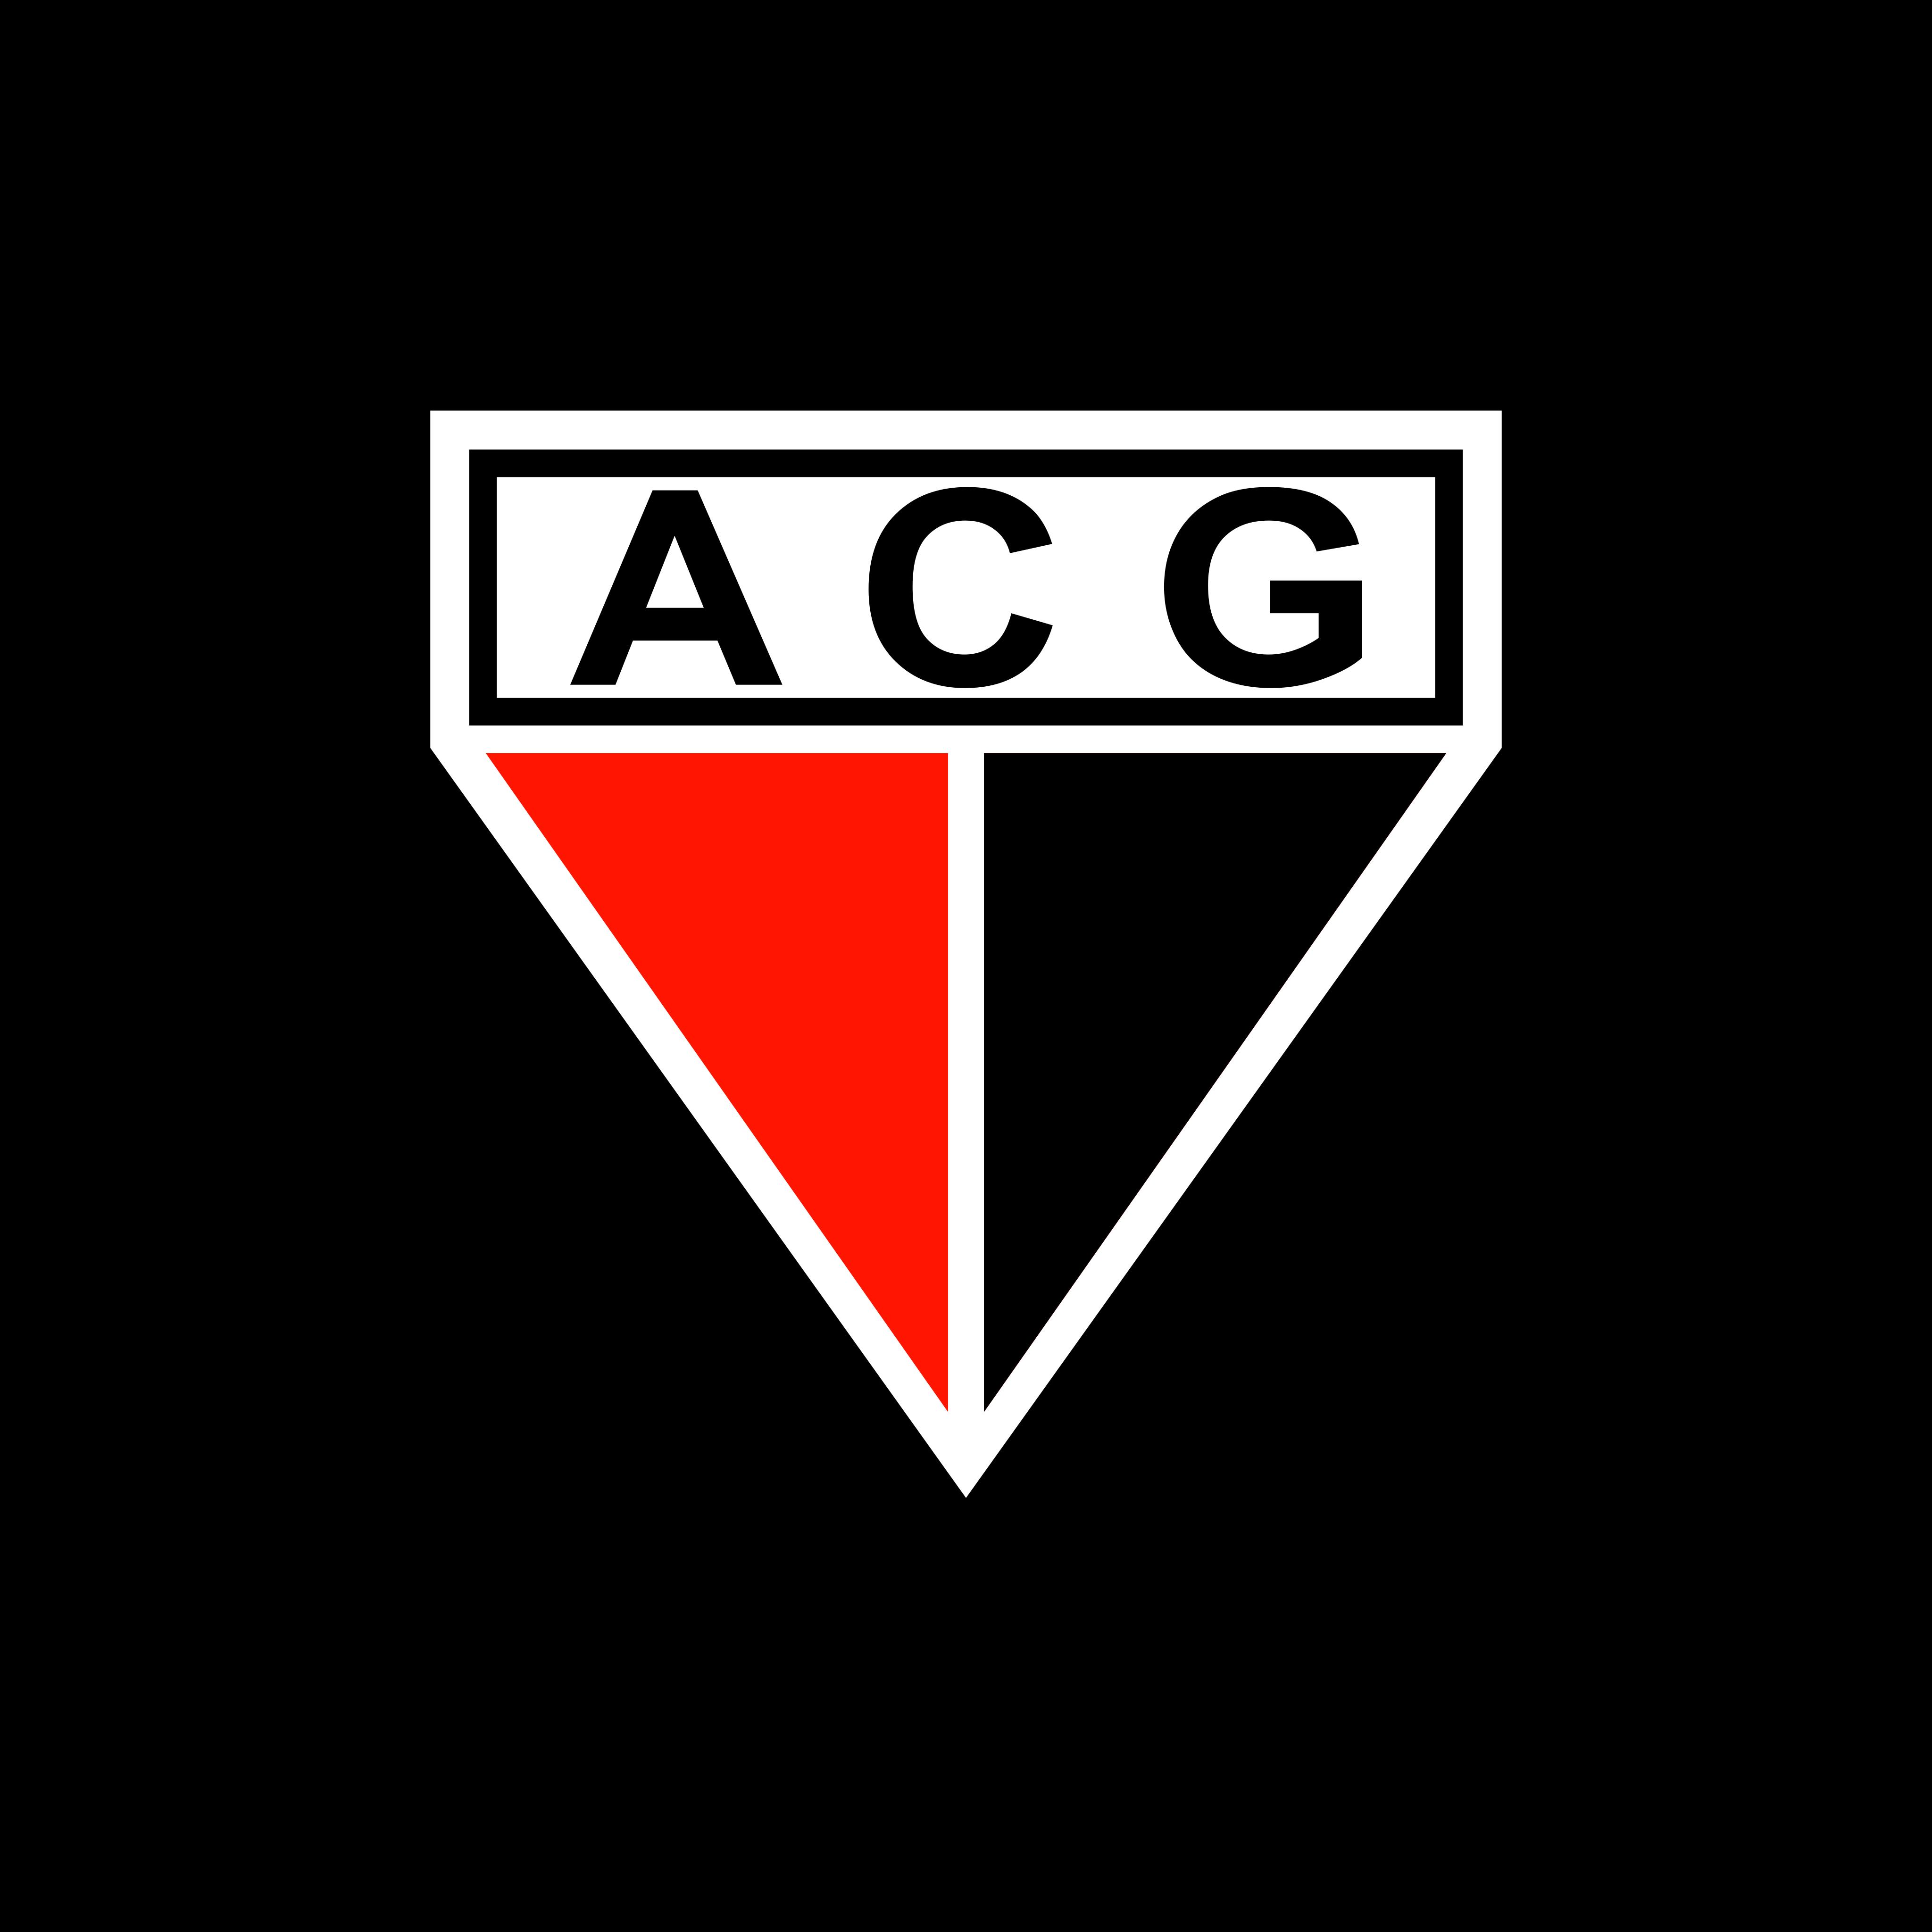 atletico go logo 0 - Atlético Goianiense Logo